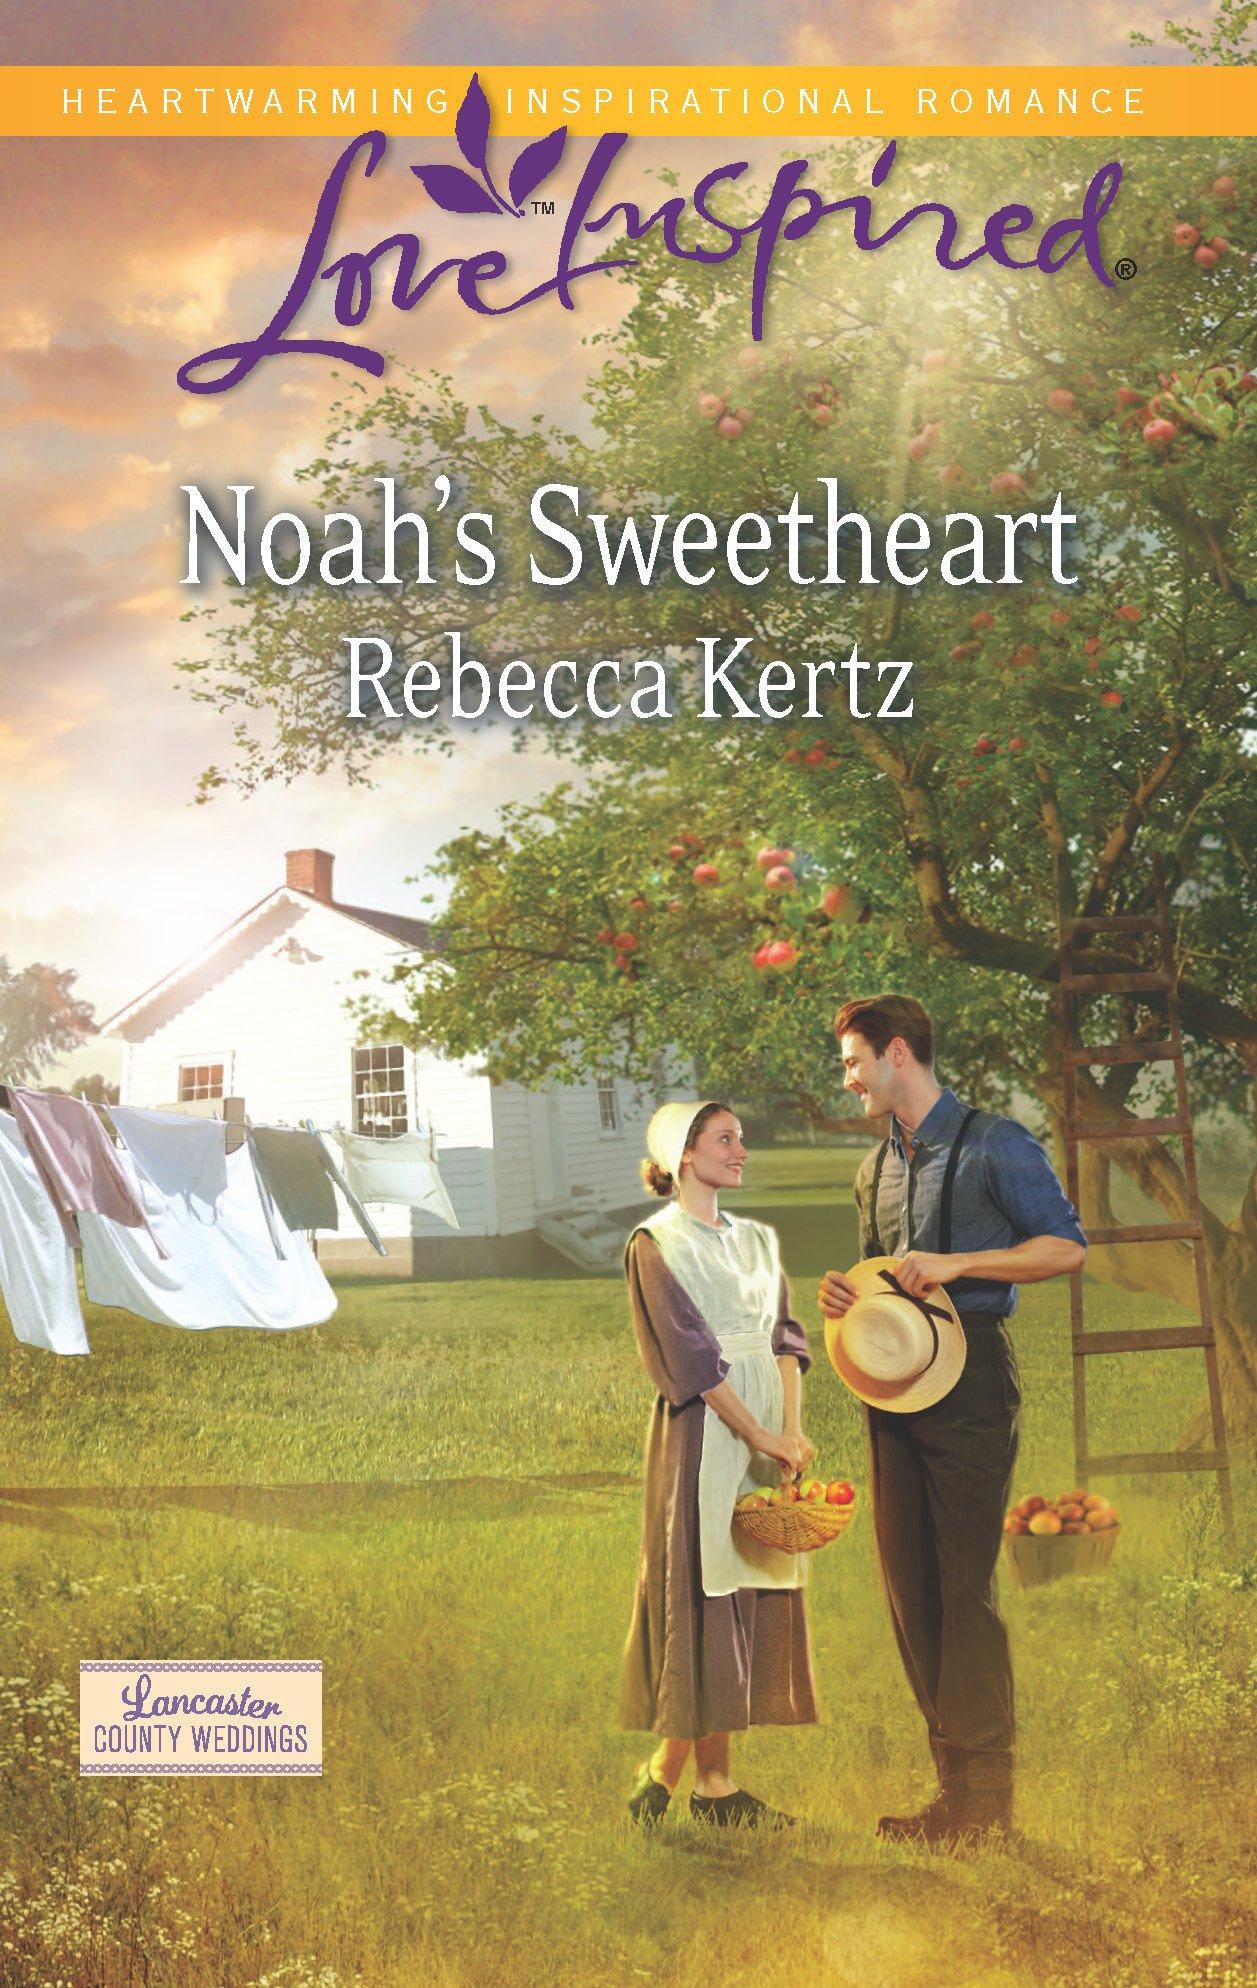 Noah's Sweetheart (Lancaster County Weddings) PDF